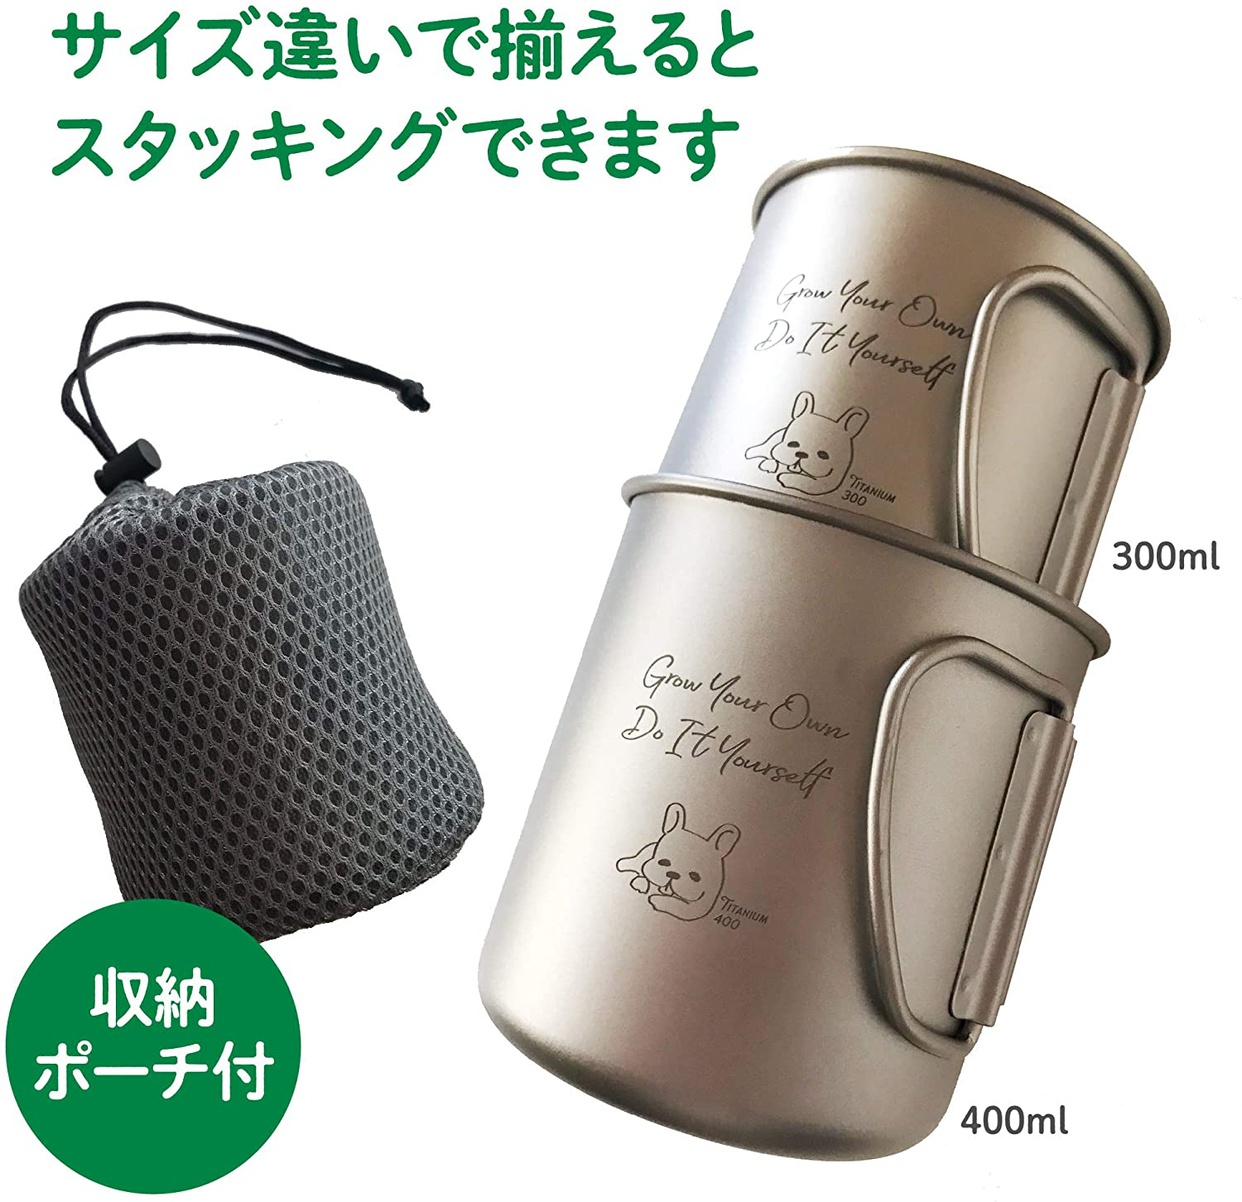 Meichan's Life(メイチャンズライフ) チタンマグの商品画像4